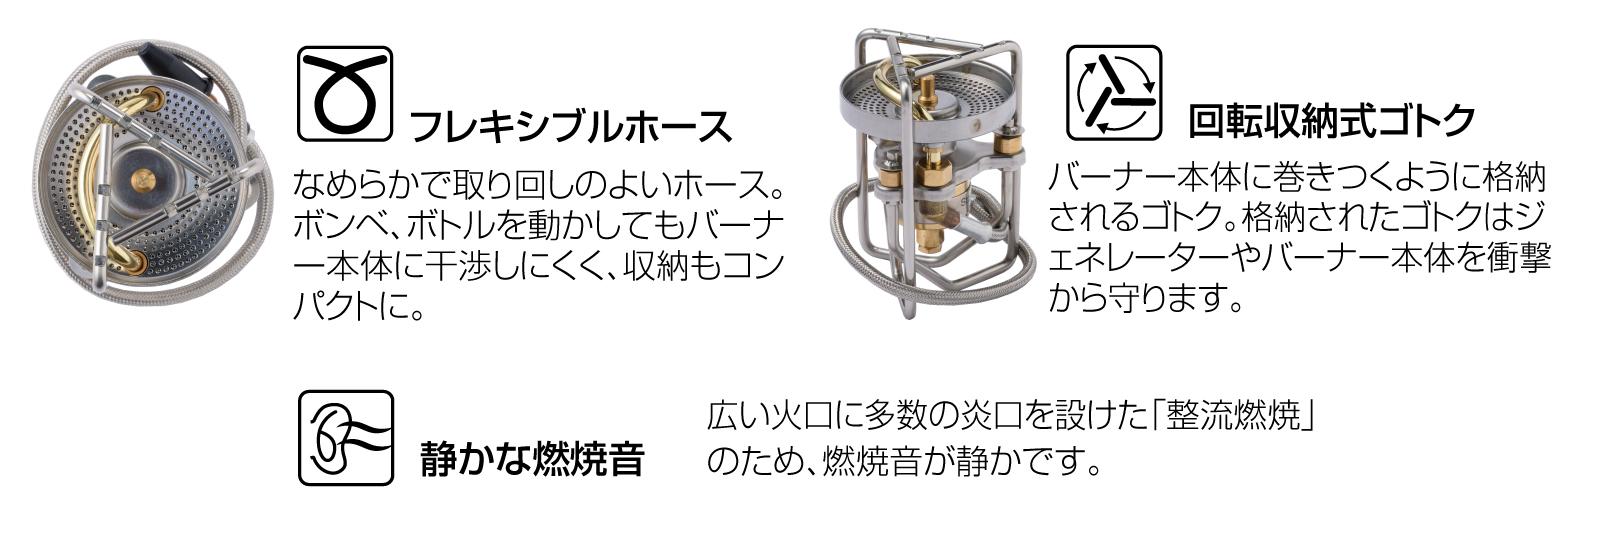 SOTO(ソト) ストームブレイカー SOD-372